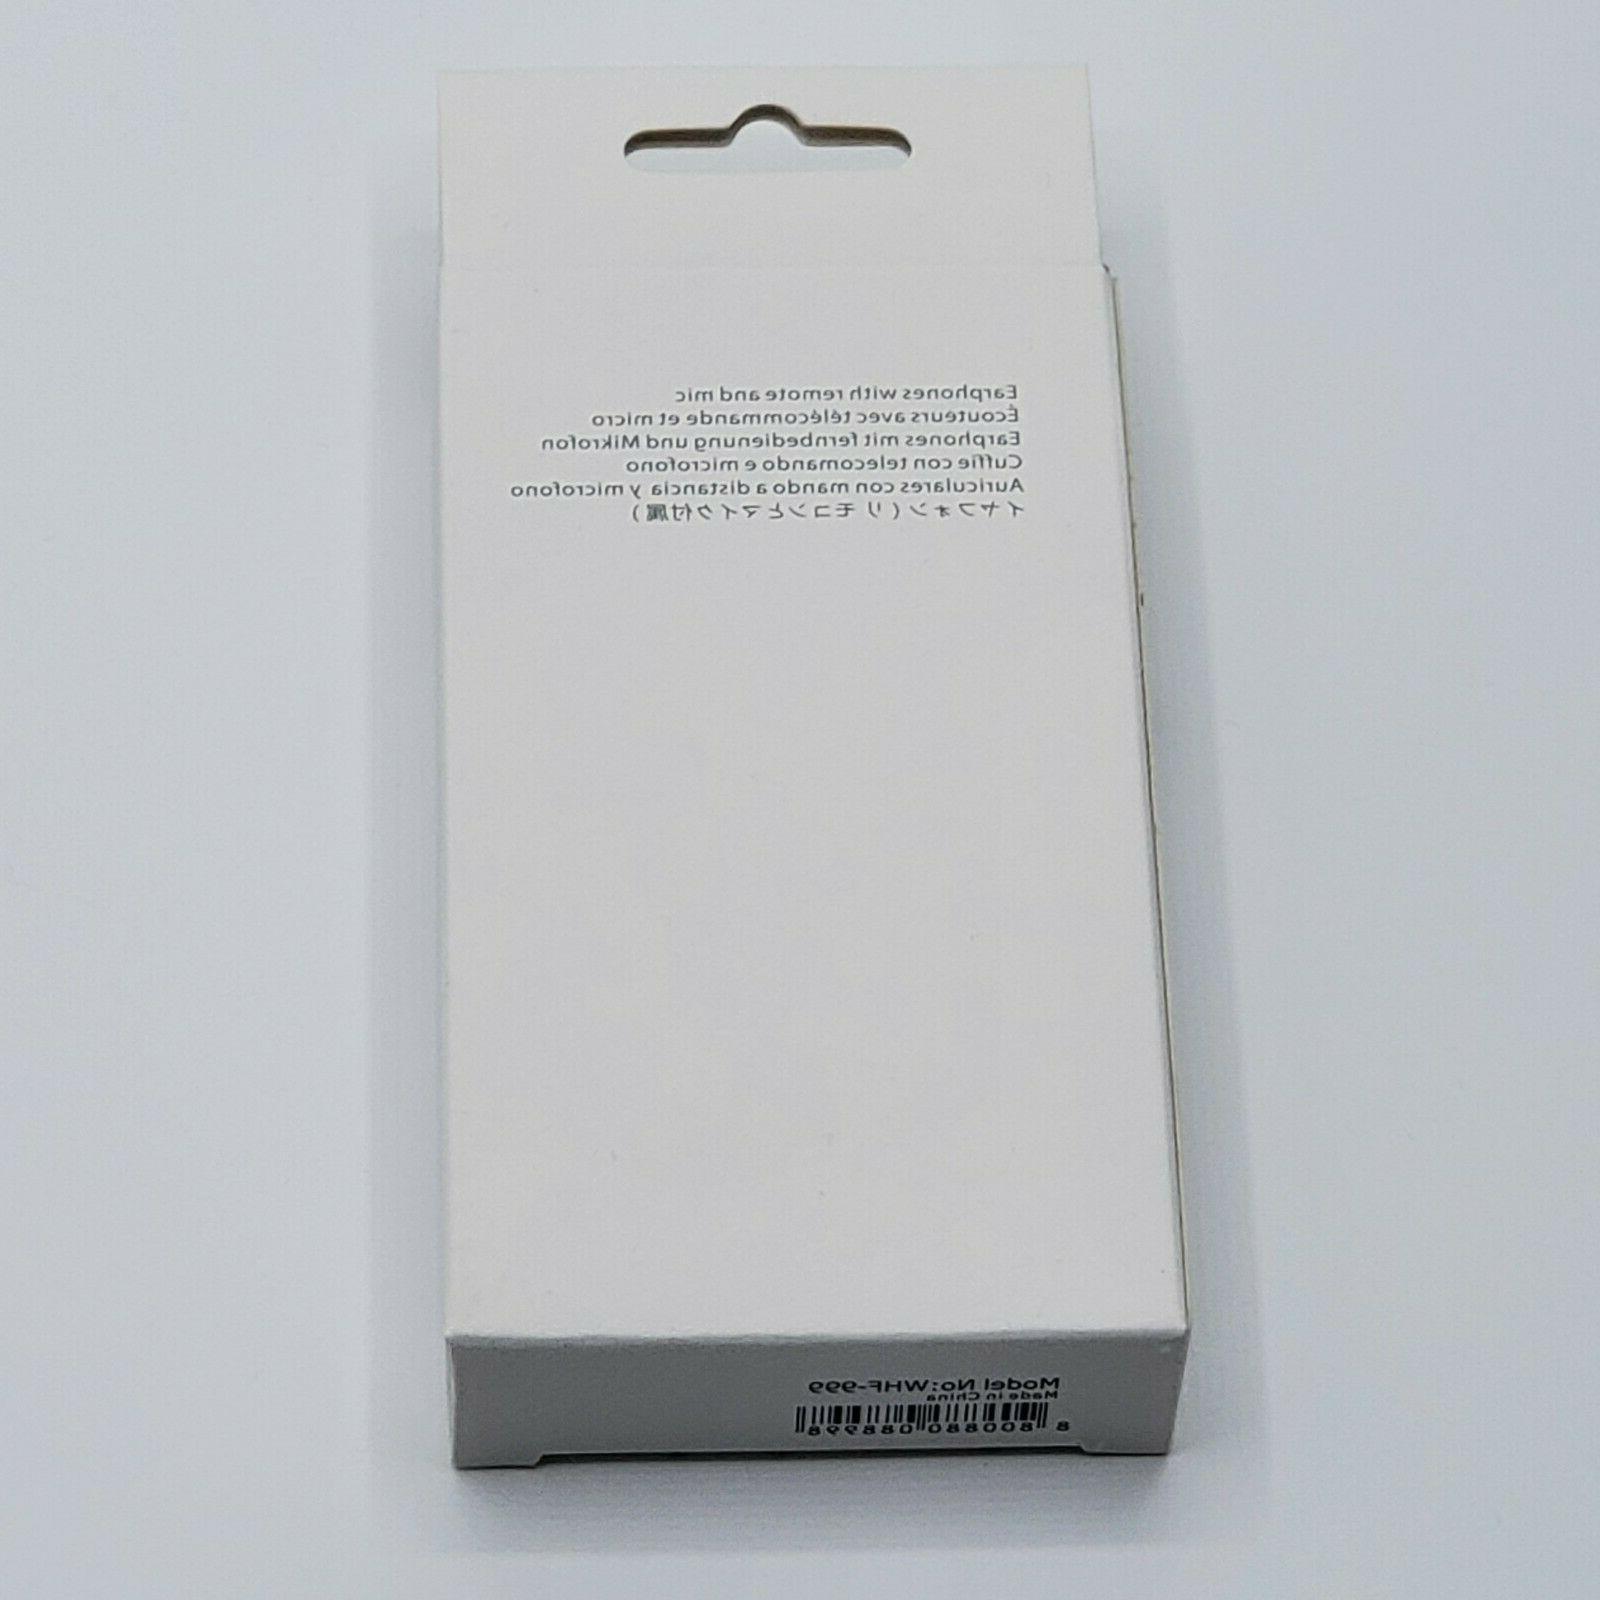 BLACK 3.5mm In Earbuds / Earphones Headphones with Microphone